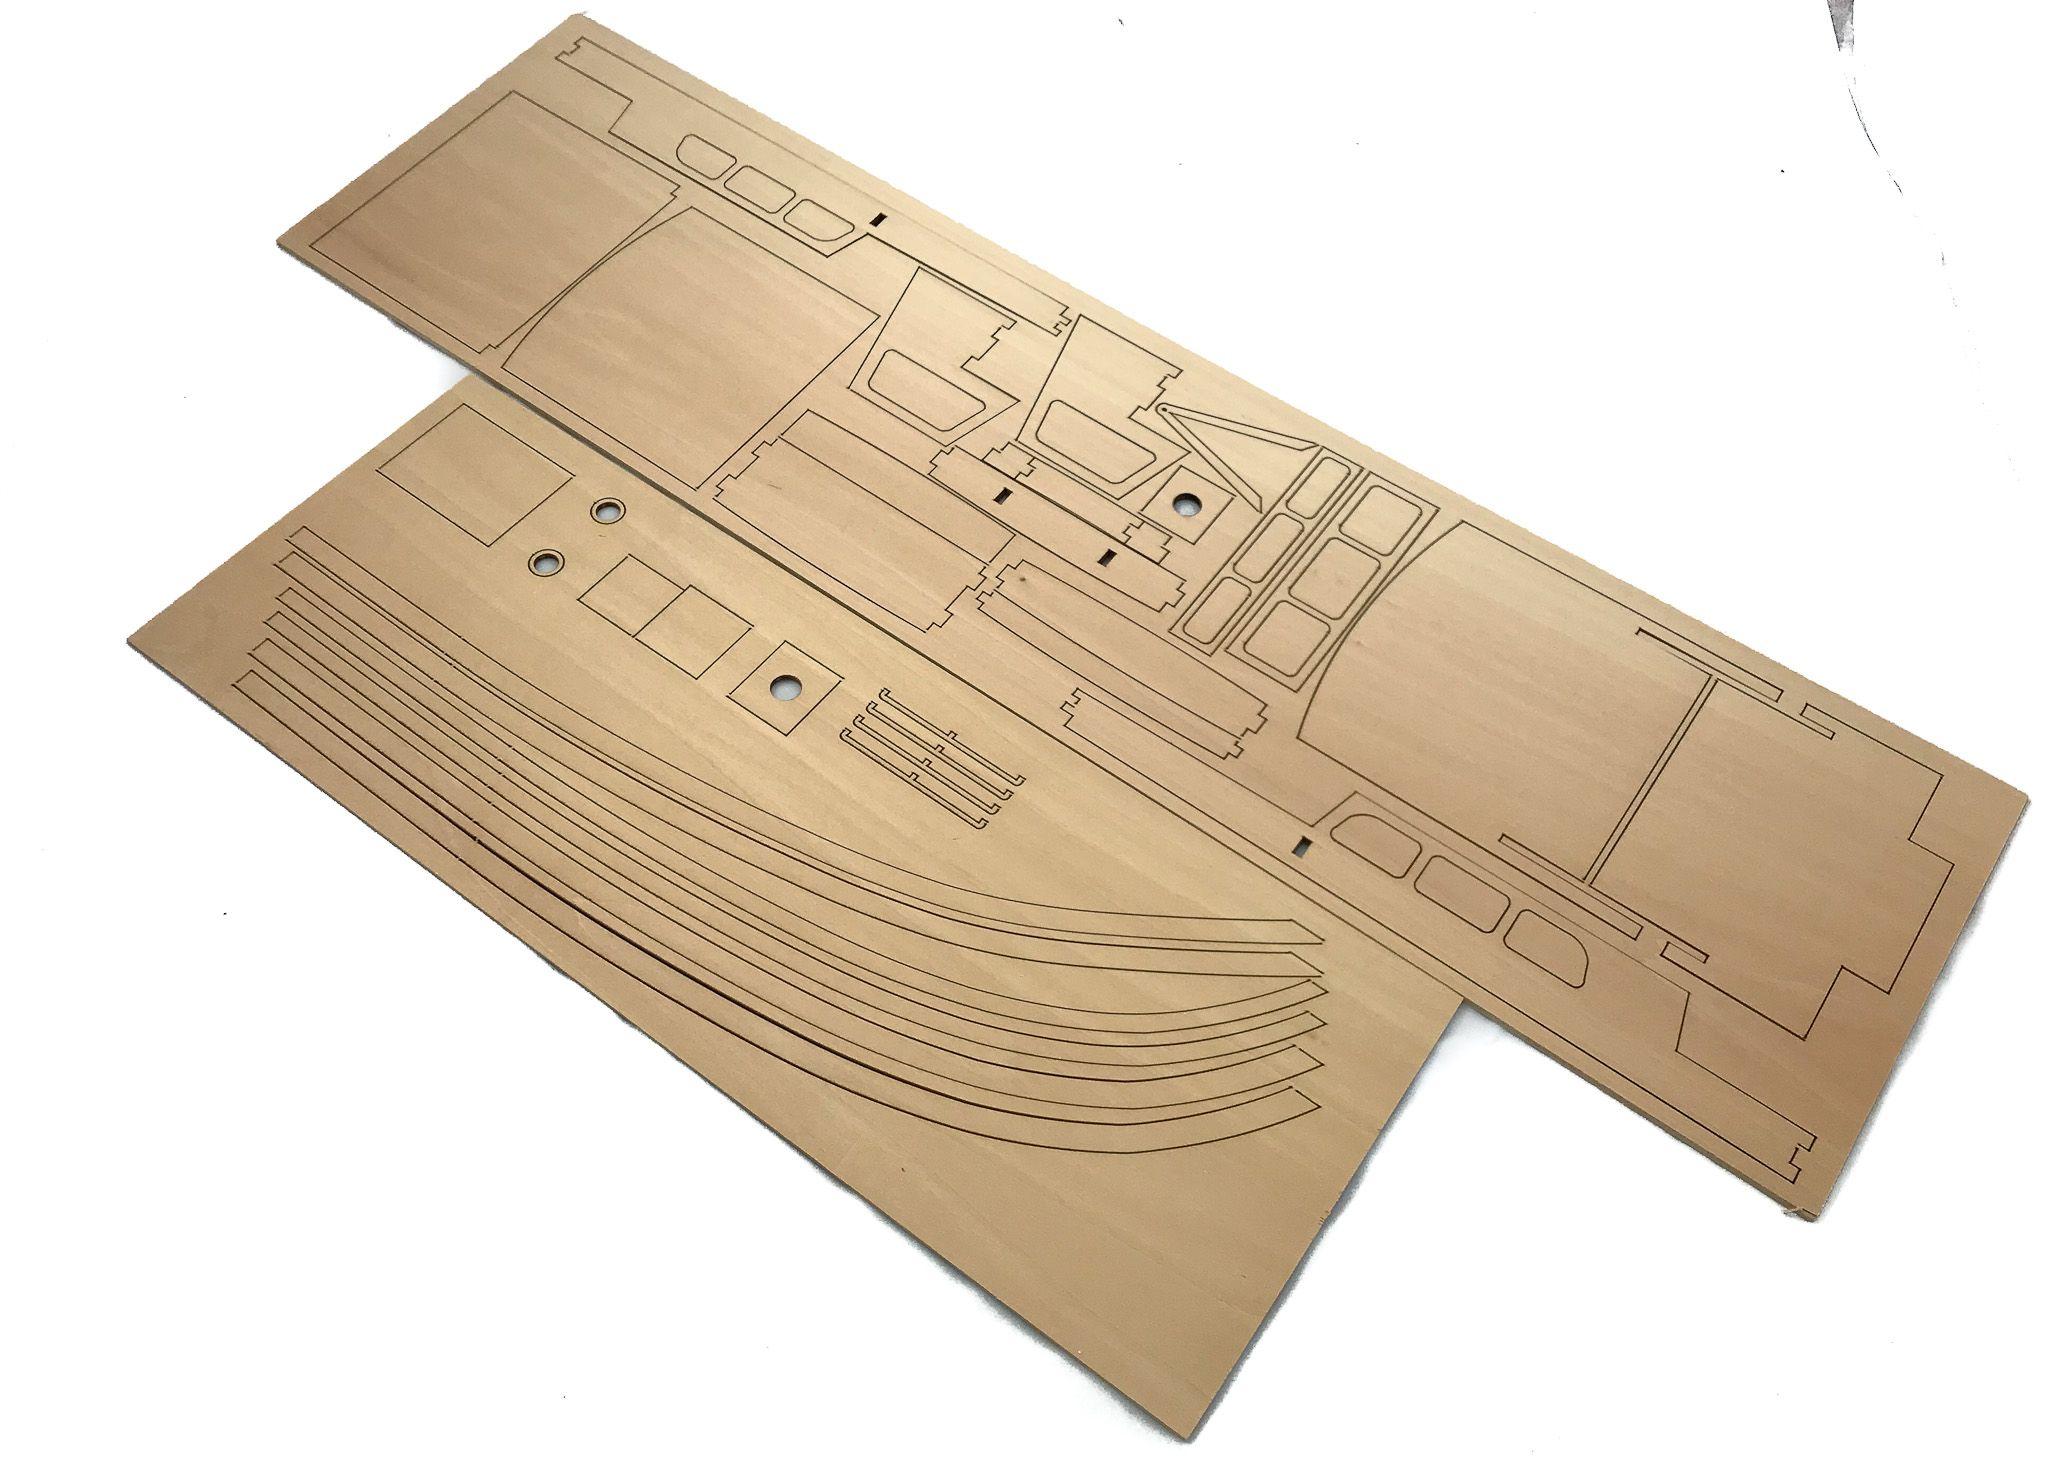 1563-13754-Bruma-Cabin-Cruiser-Kit-Mantua-models-736